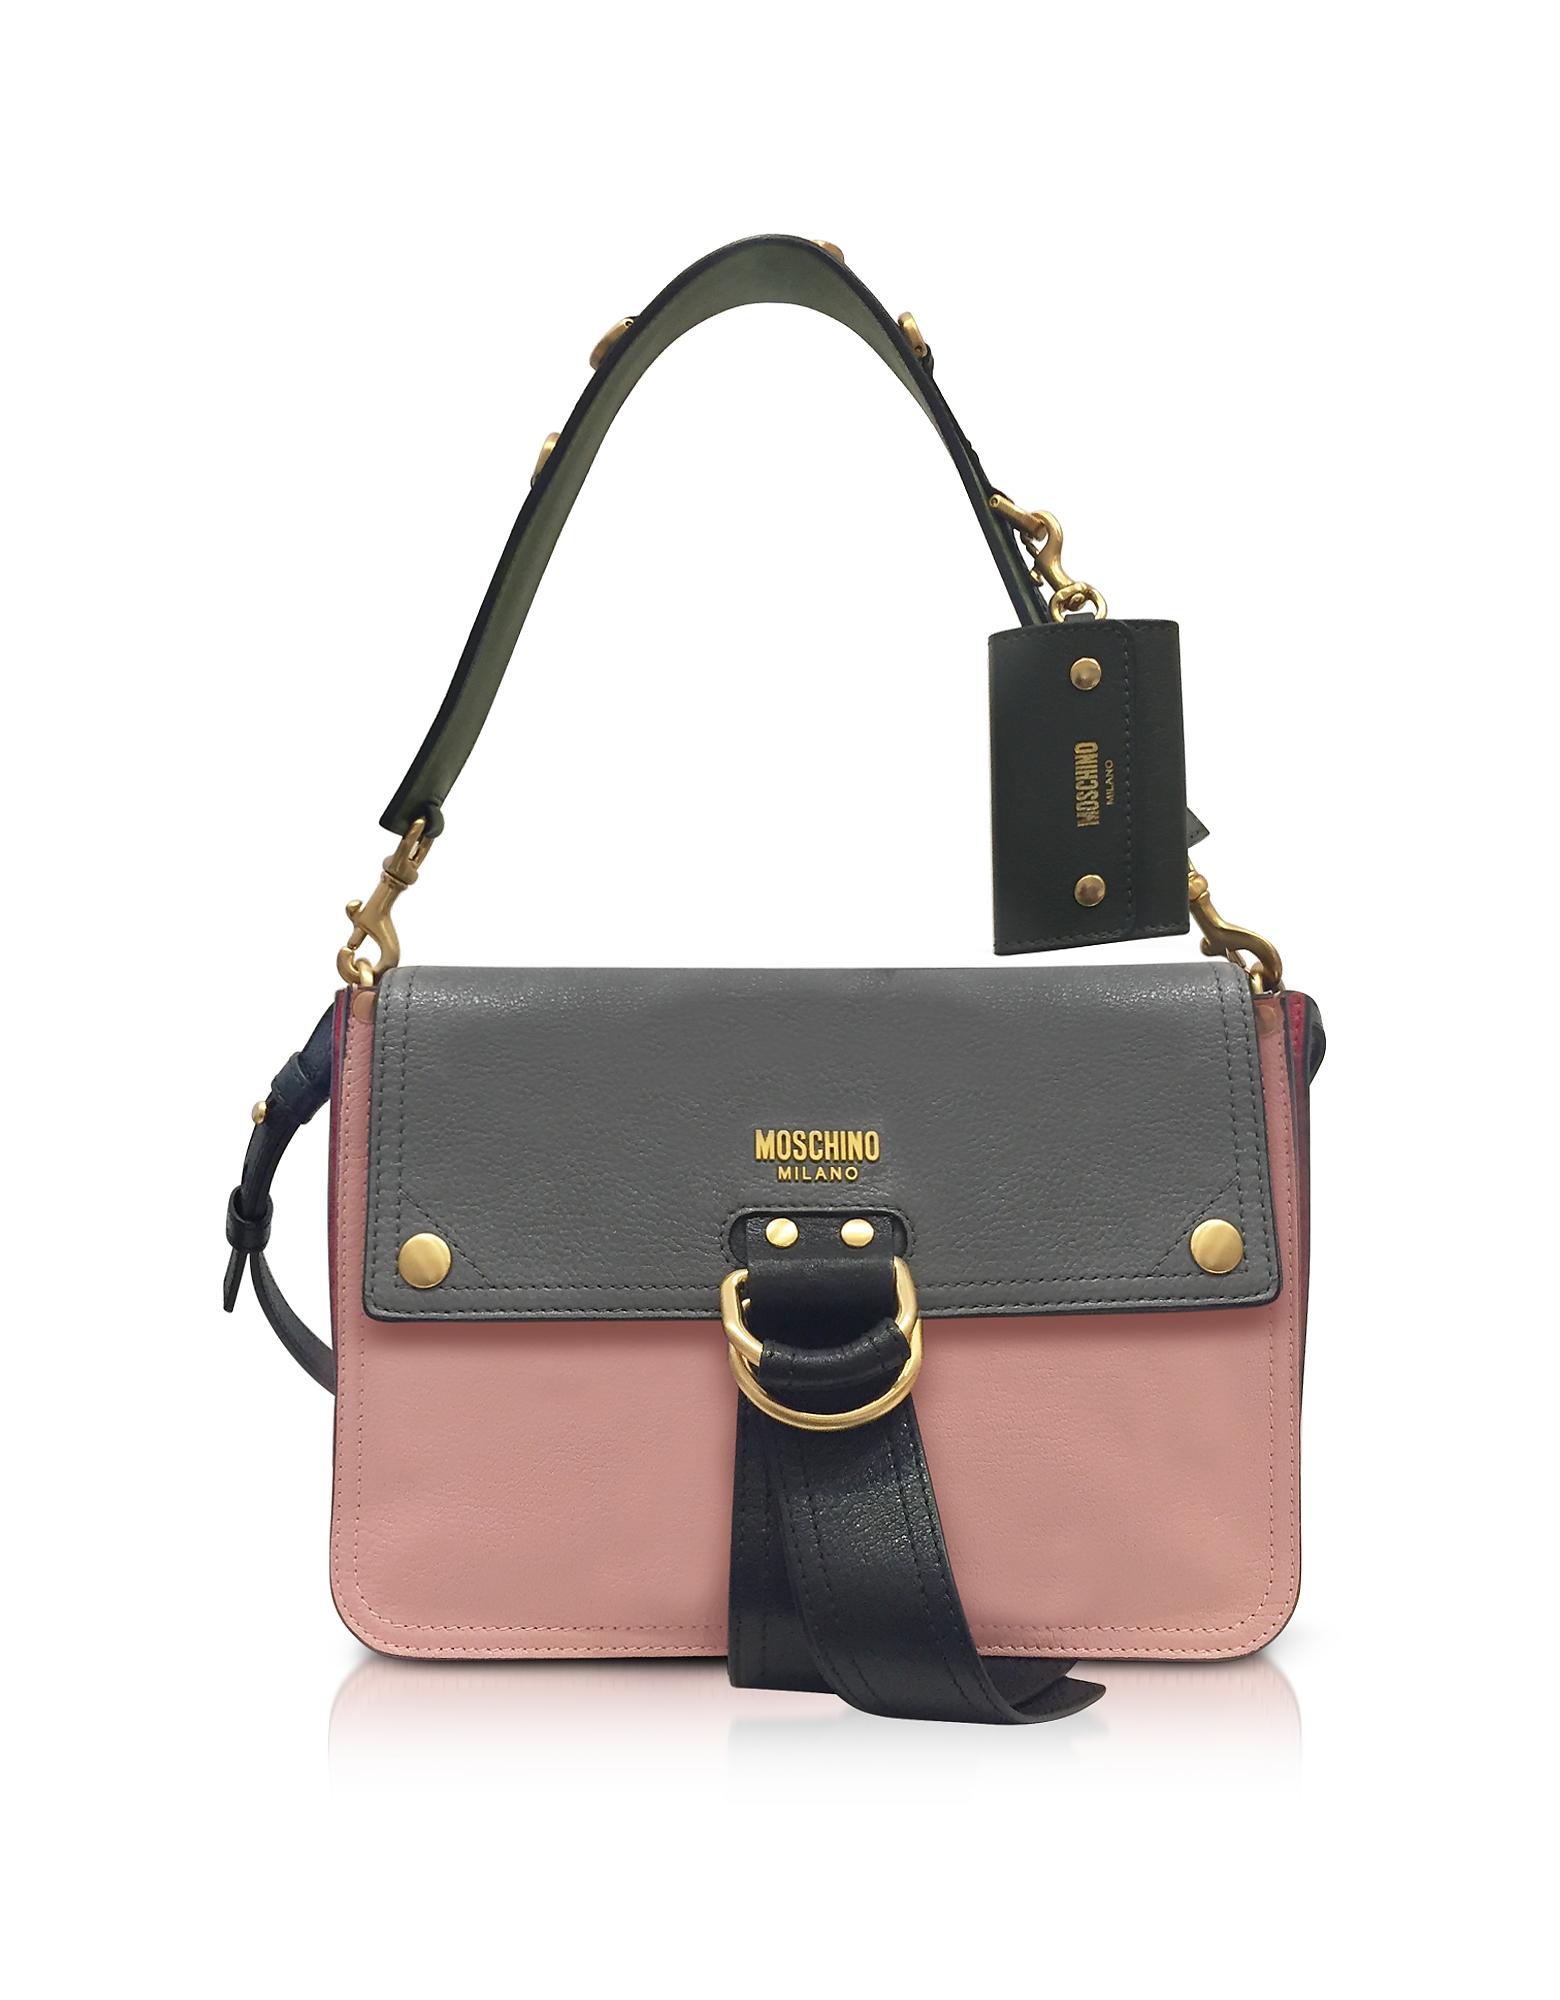 Moschino Handbags, Color Block Leather Flap Shoulder Bag